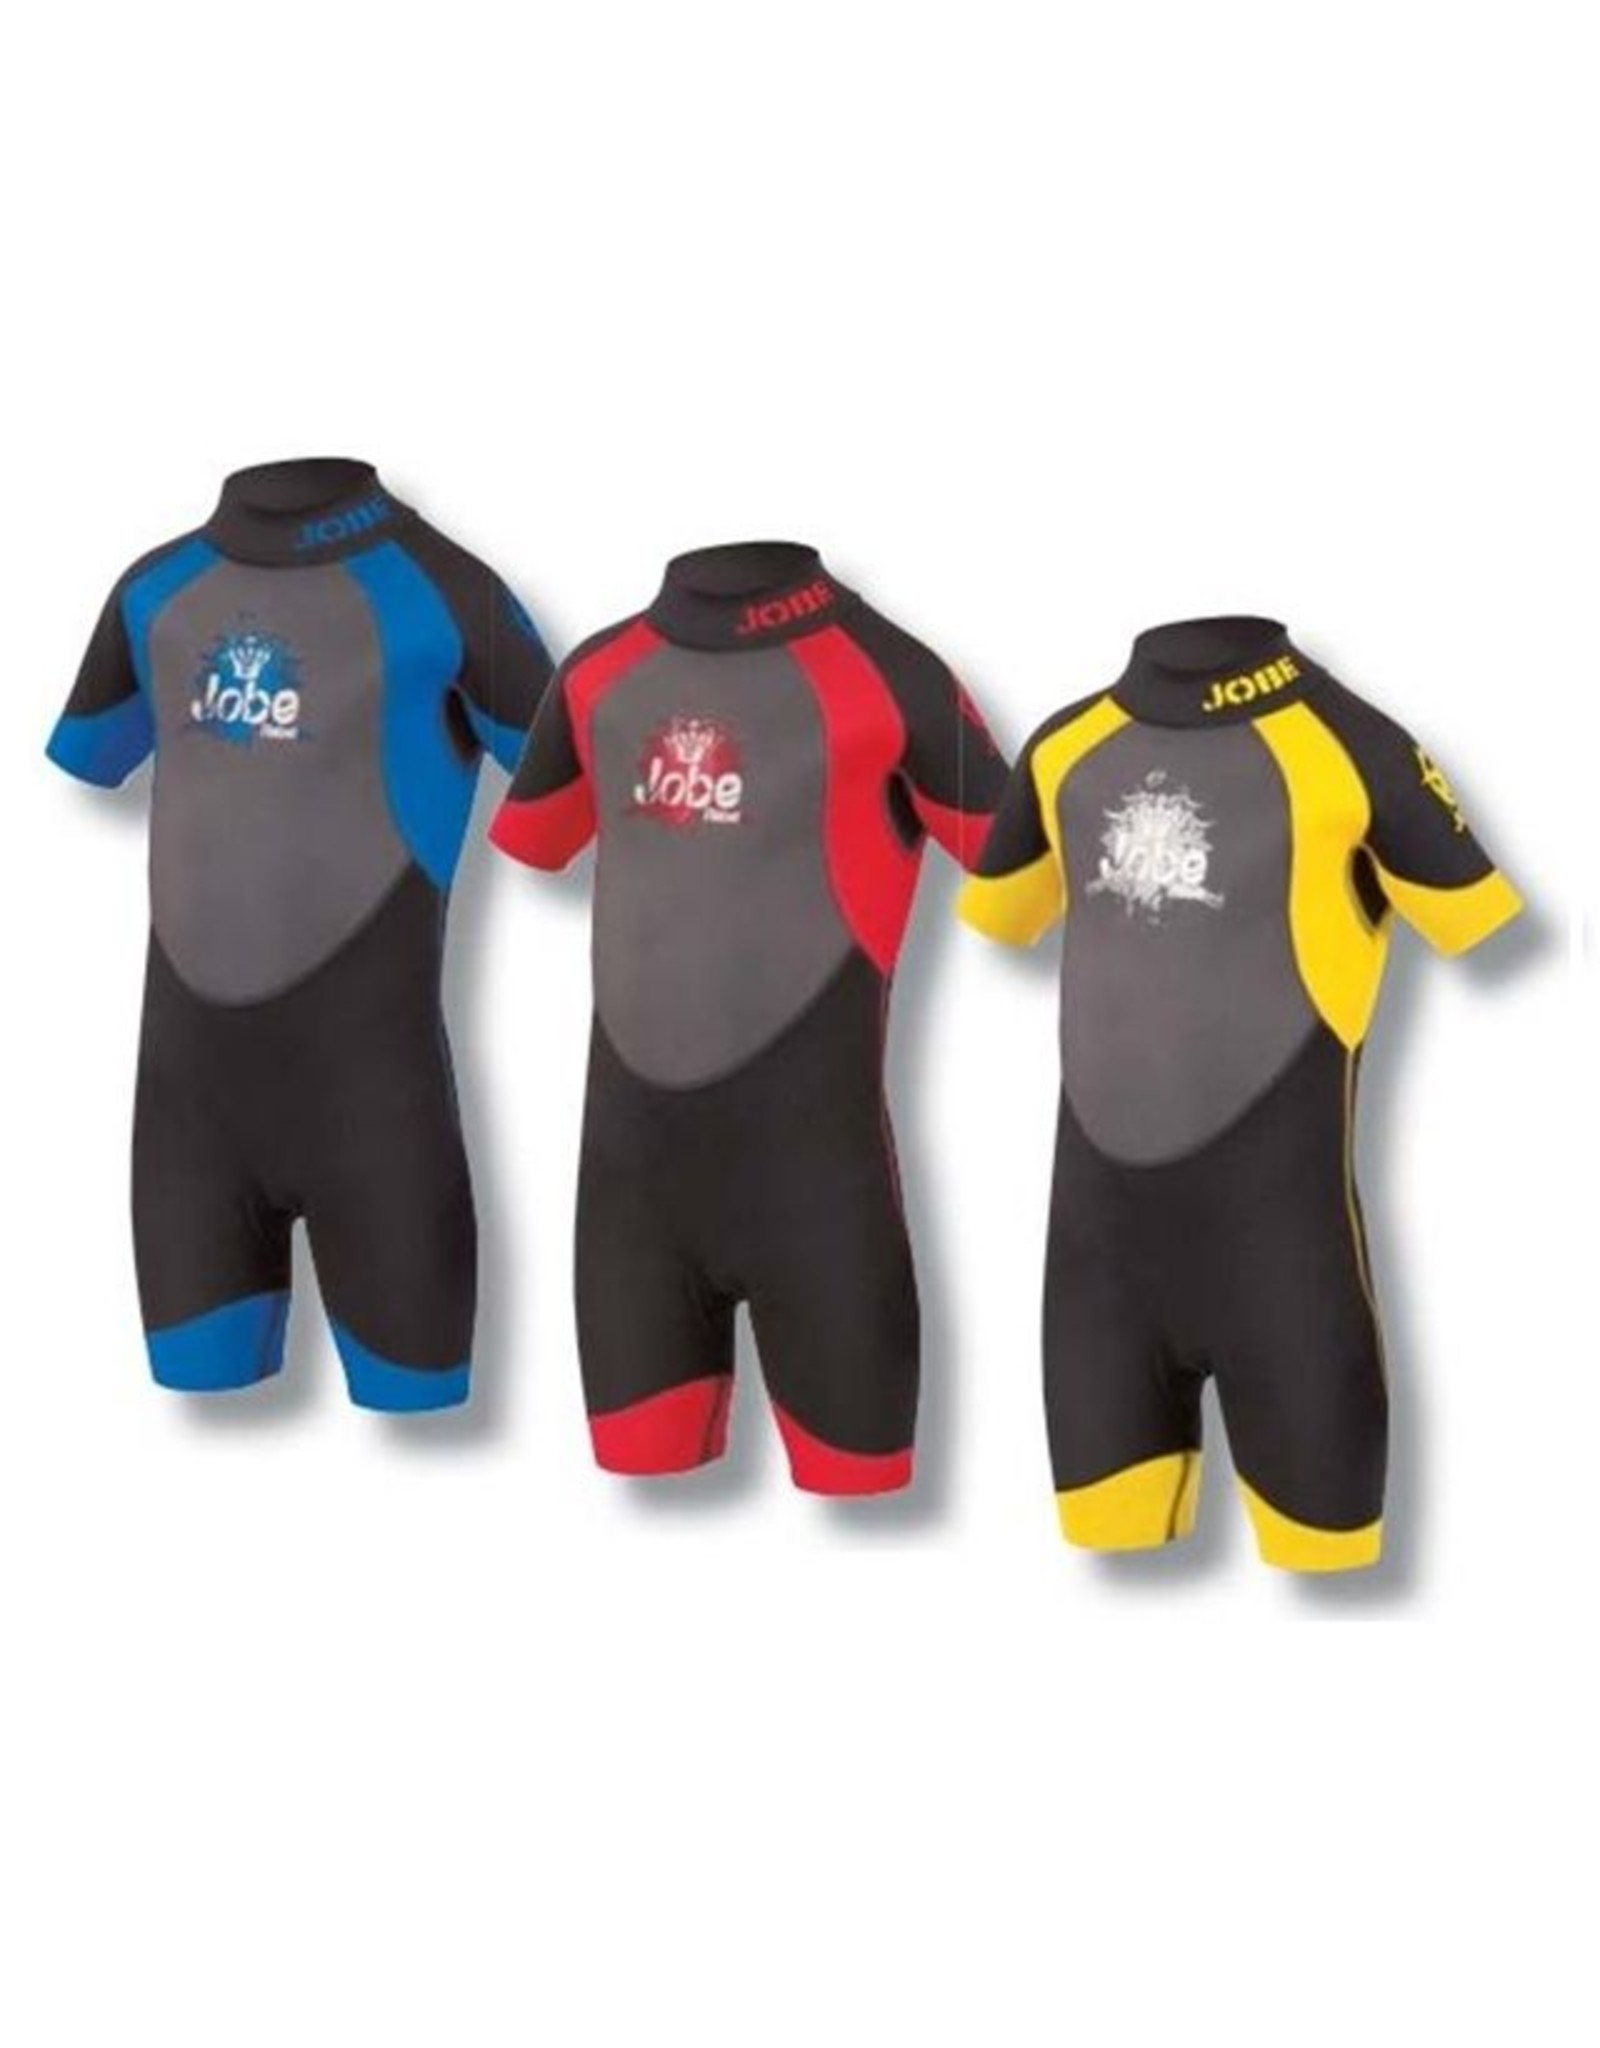 Hebor Watersport Jobe Shorty Rebel kinder wetsuit